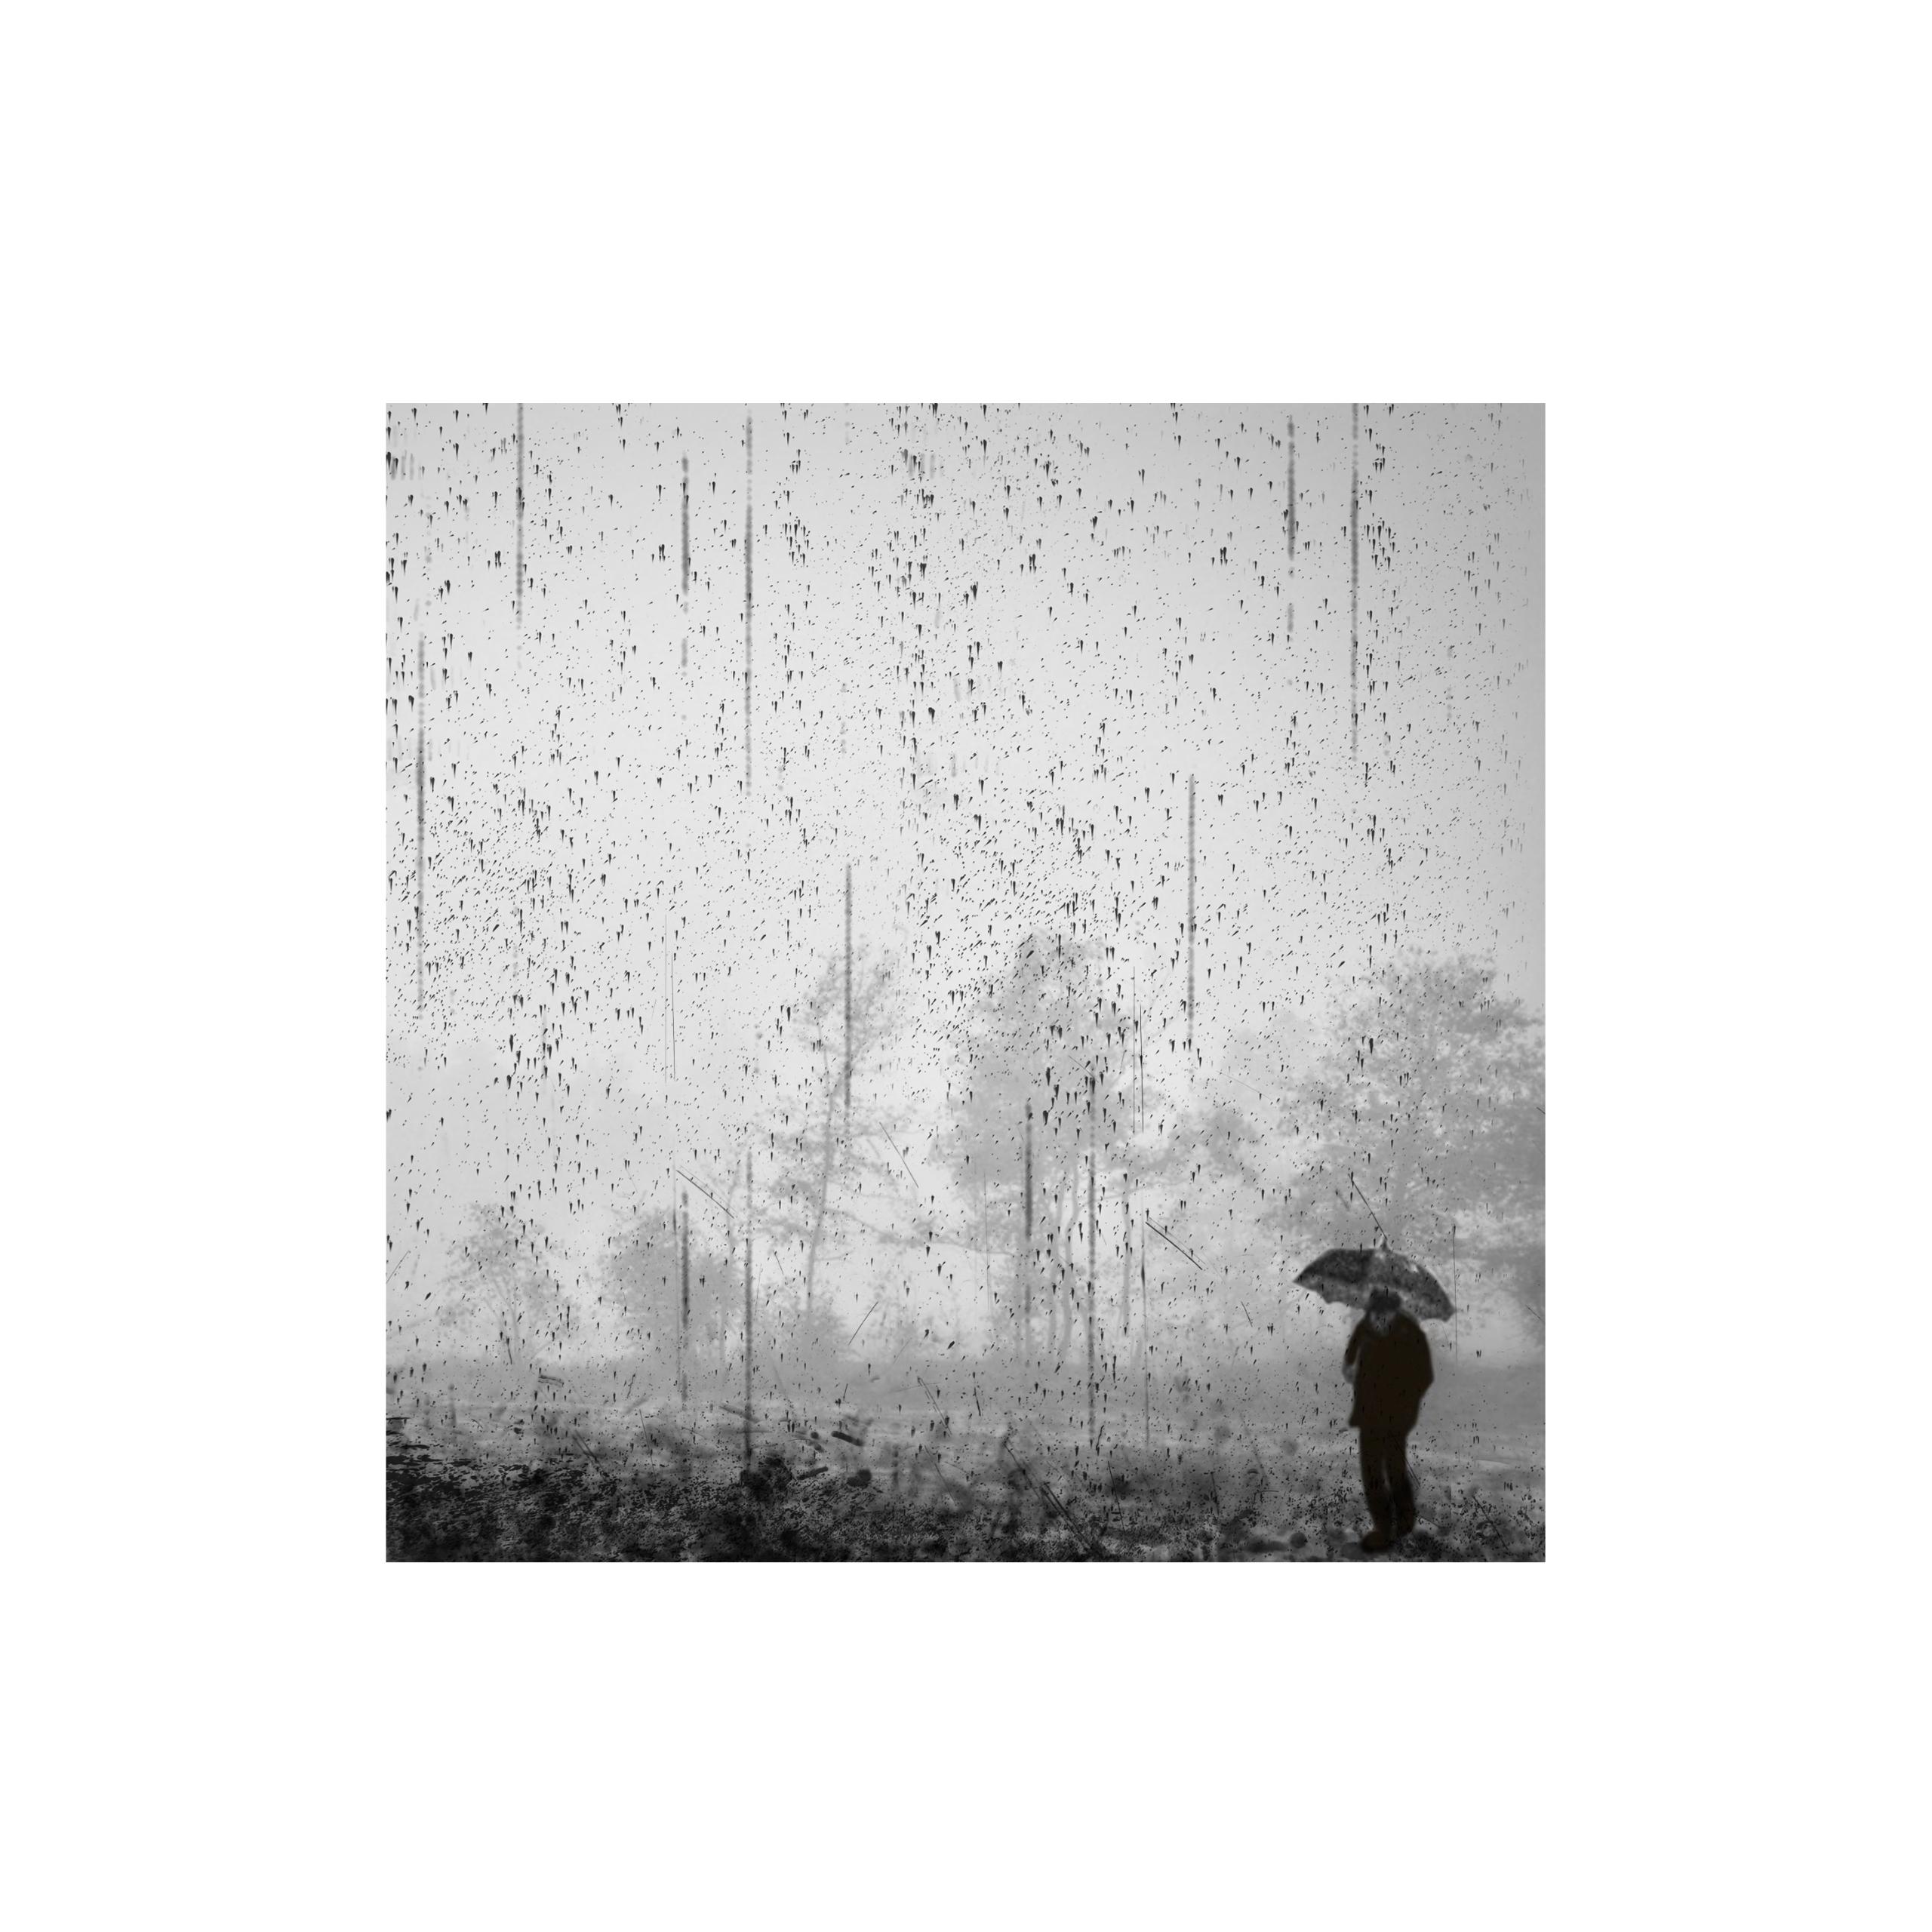 Rain, rain, rain - monique2211 | ello